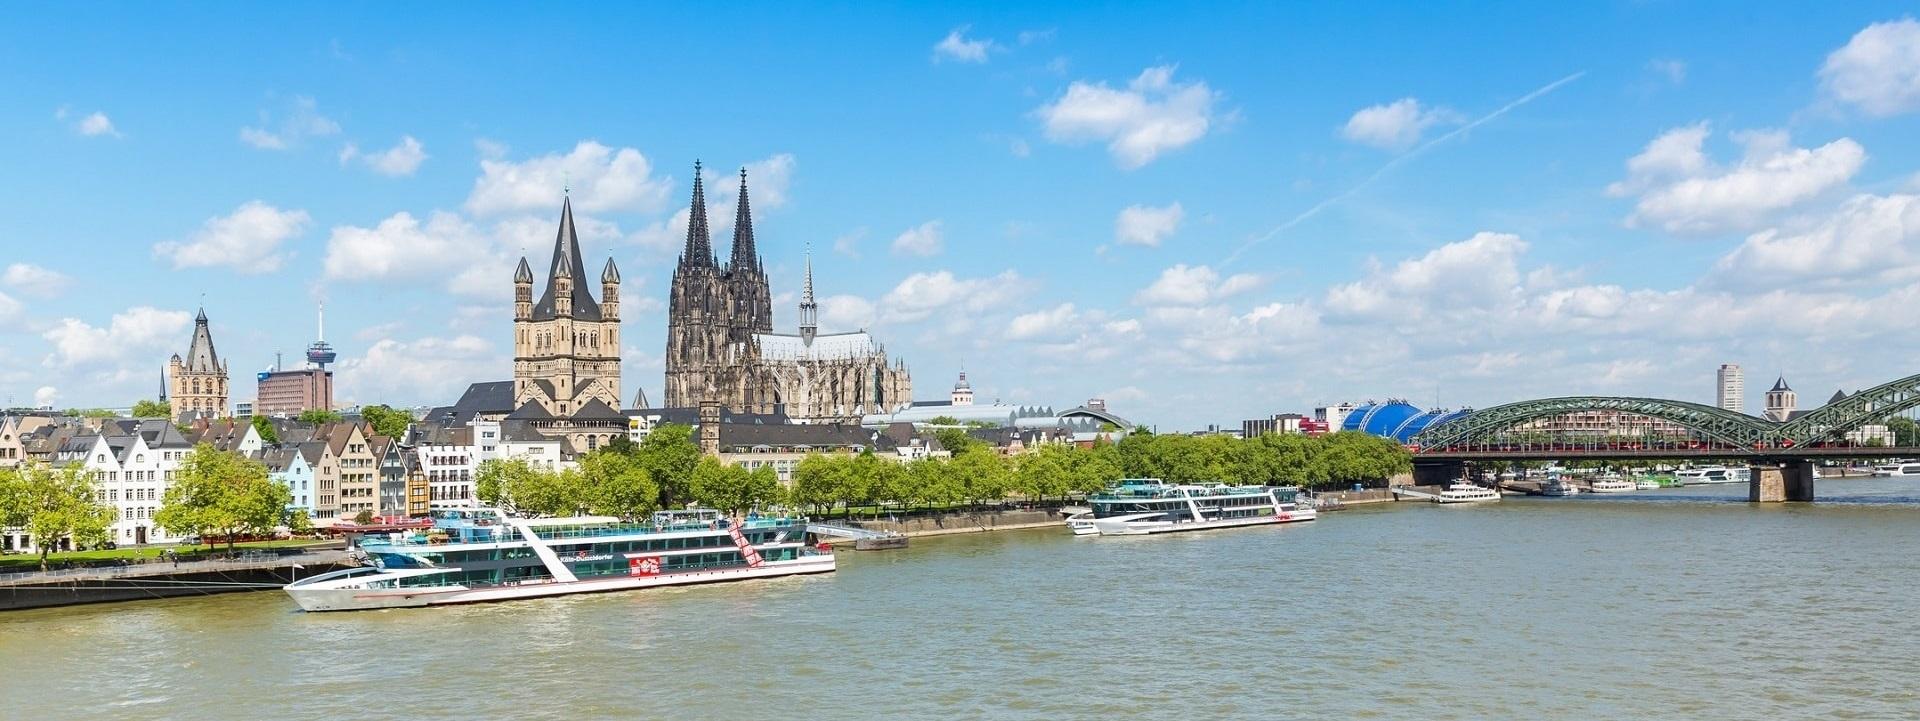 Stadt Köln im Sommer